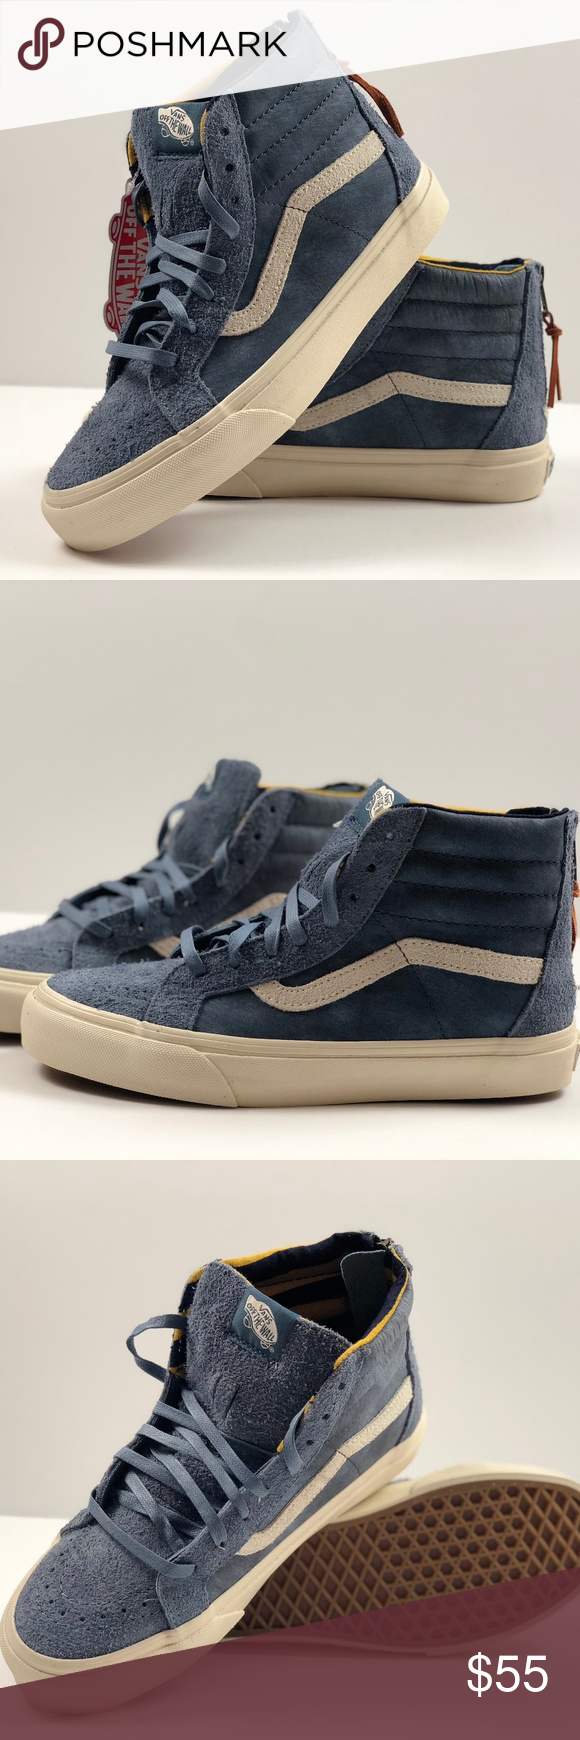 16b3d8f00bb343 Vans SK8 - Hi Zip DX Varsity Blue Sneakers. Vans SK8 - Hi Zip DX